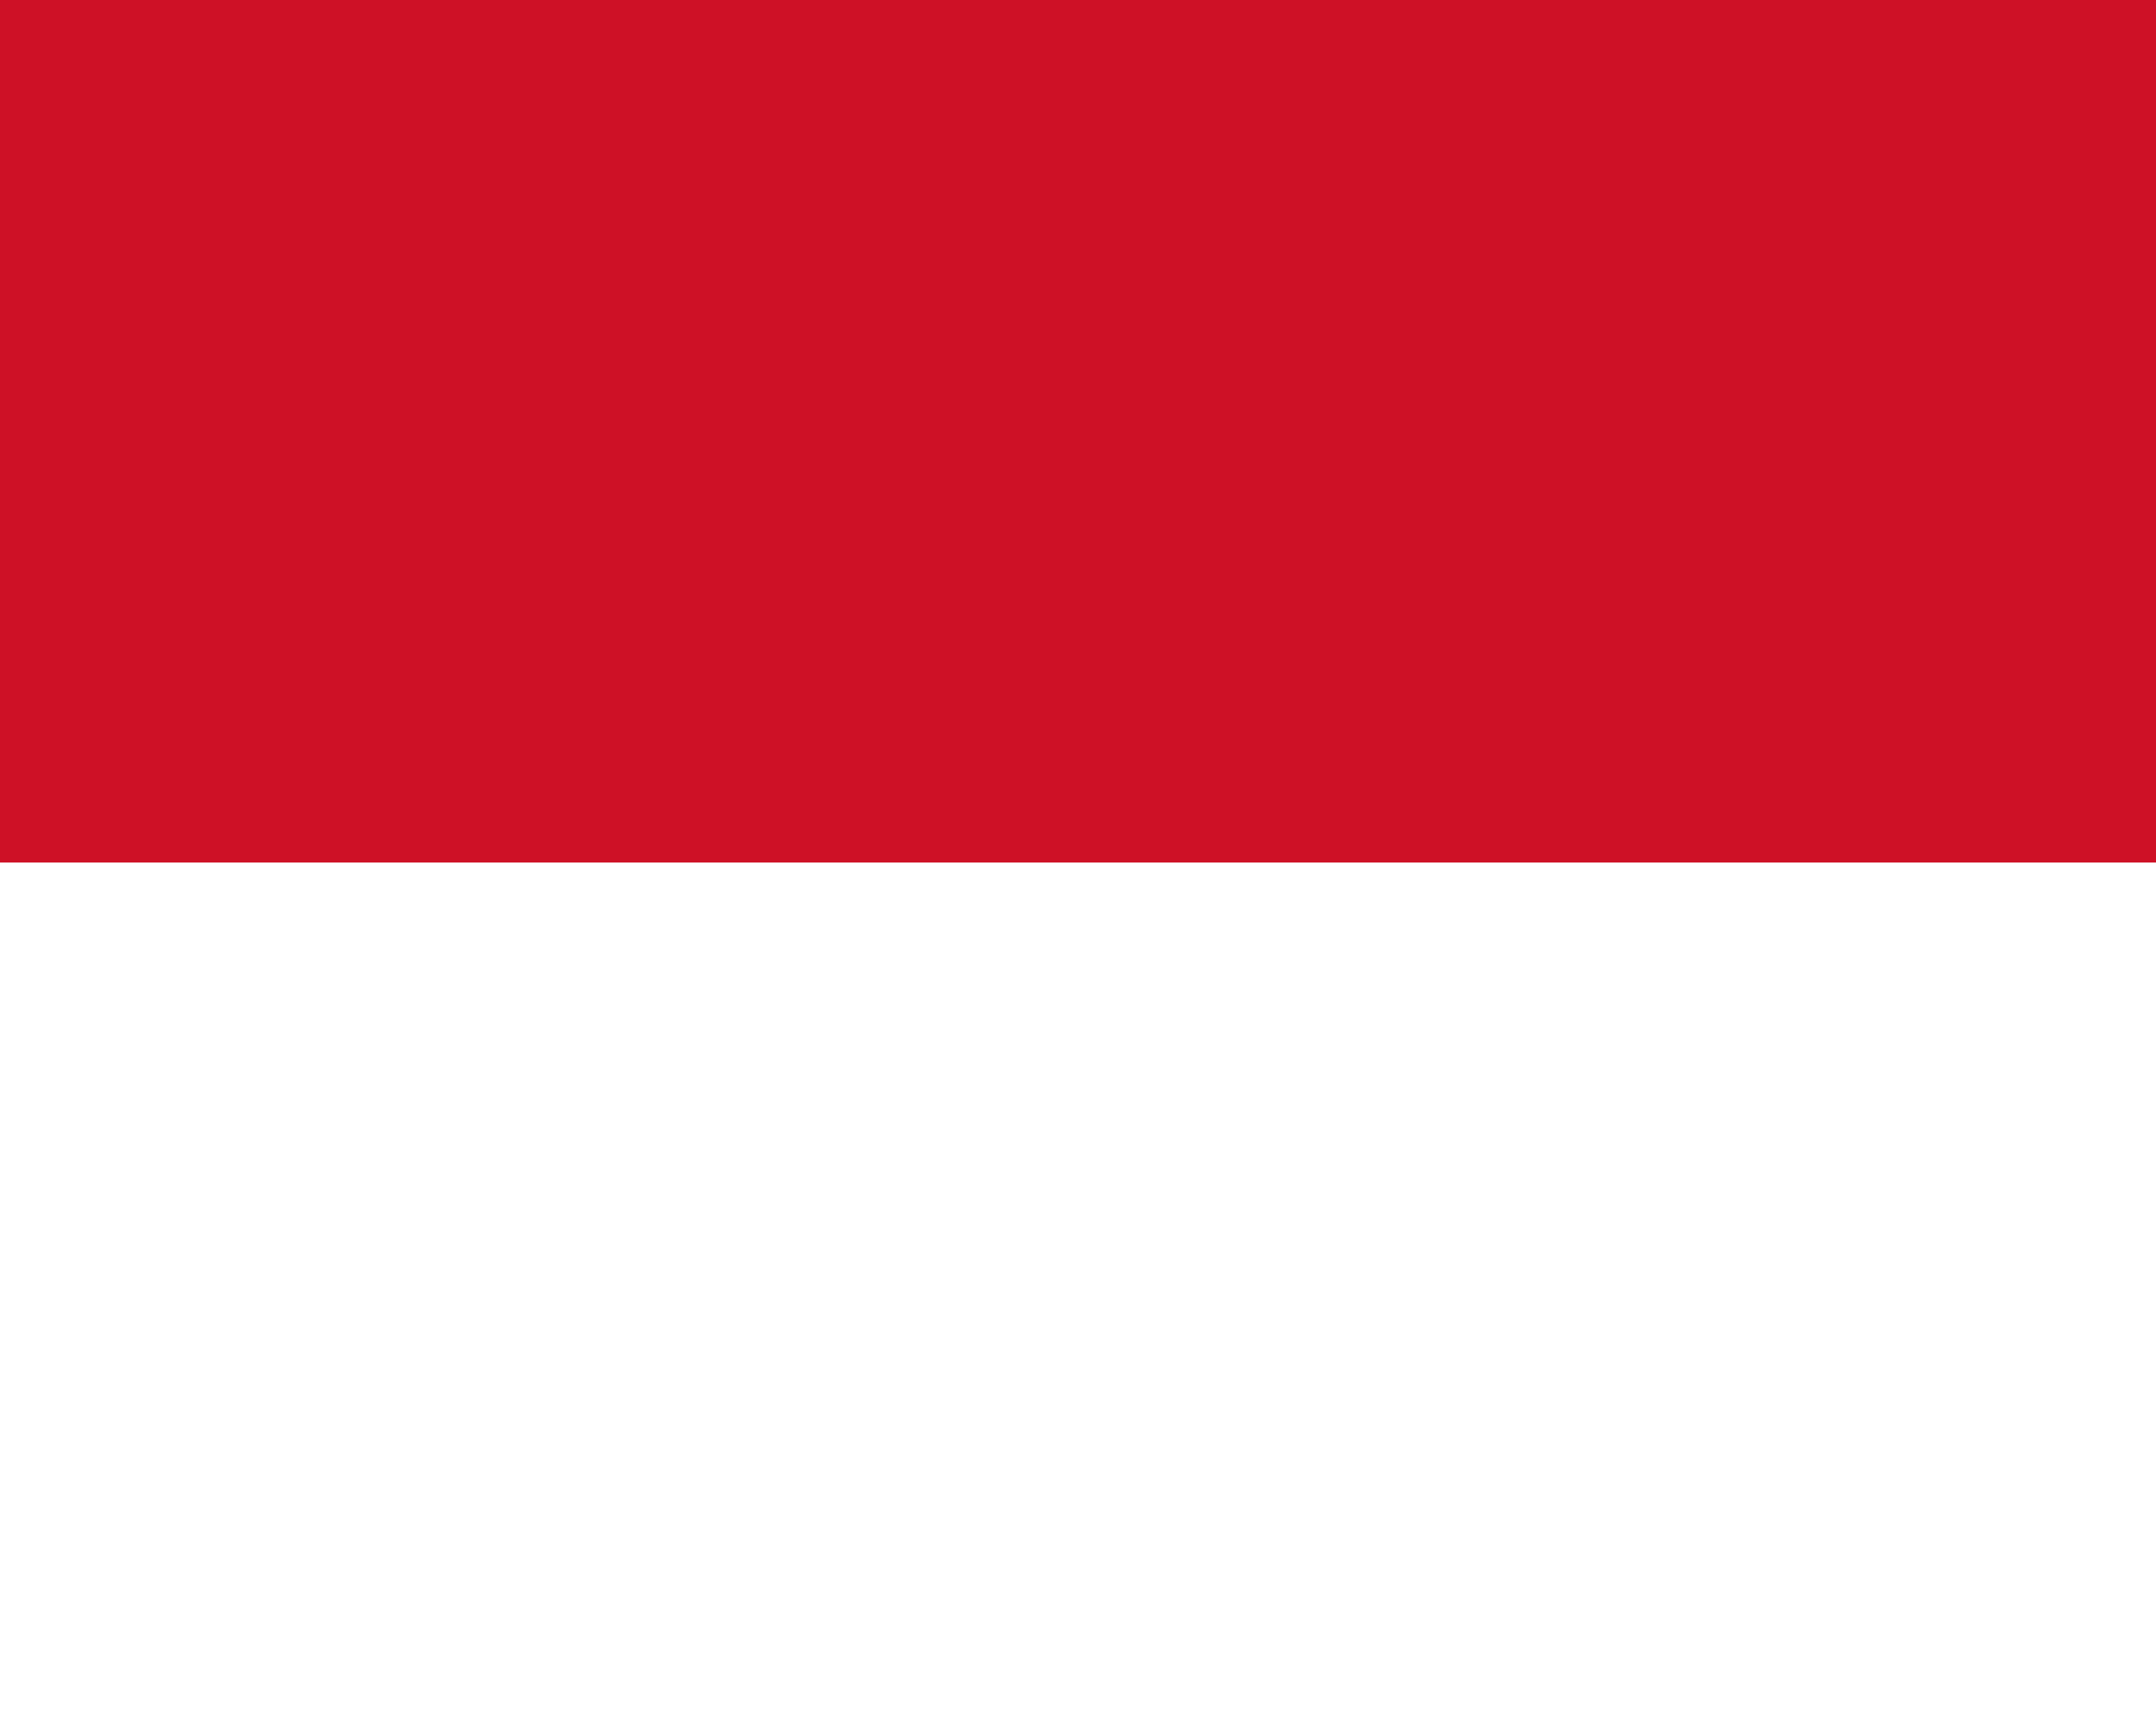 Monaco Flag Image - Free Download